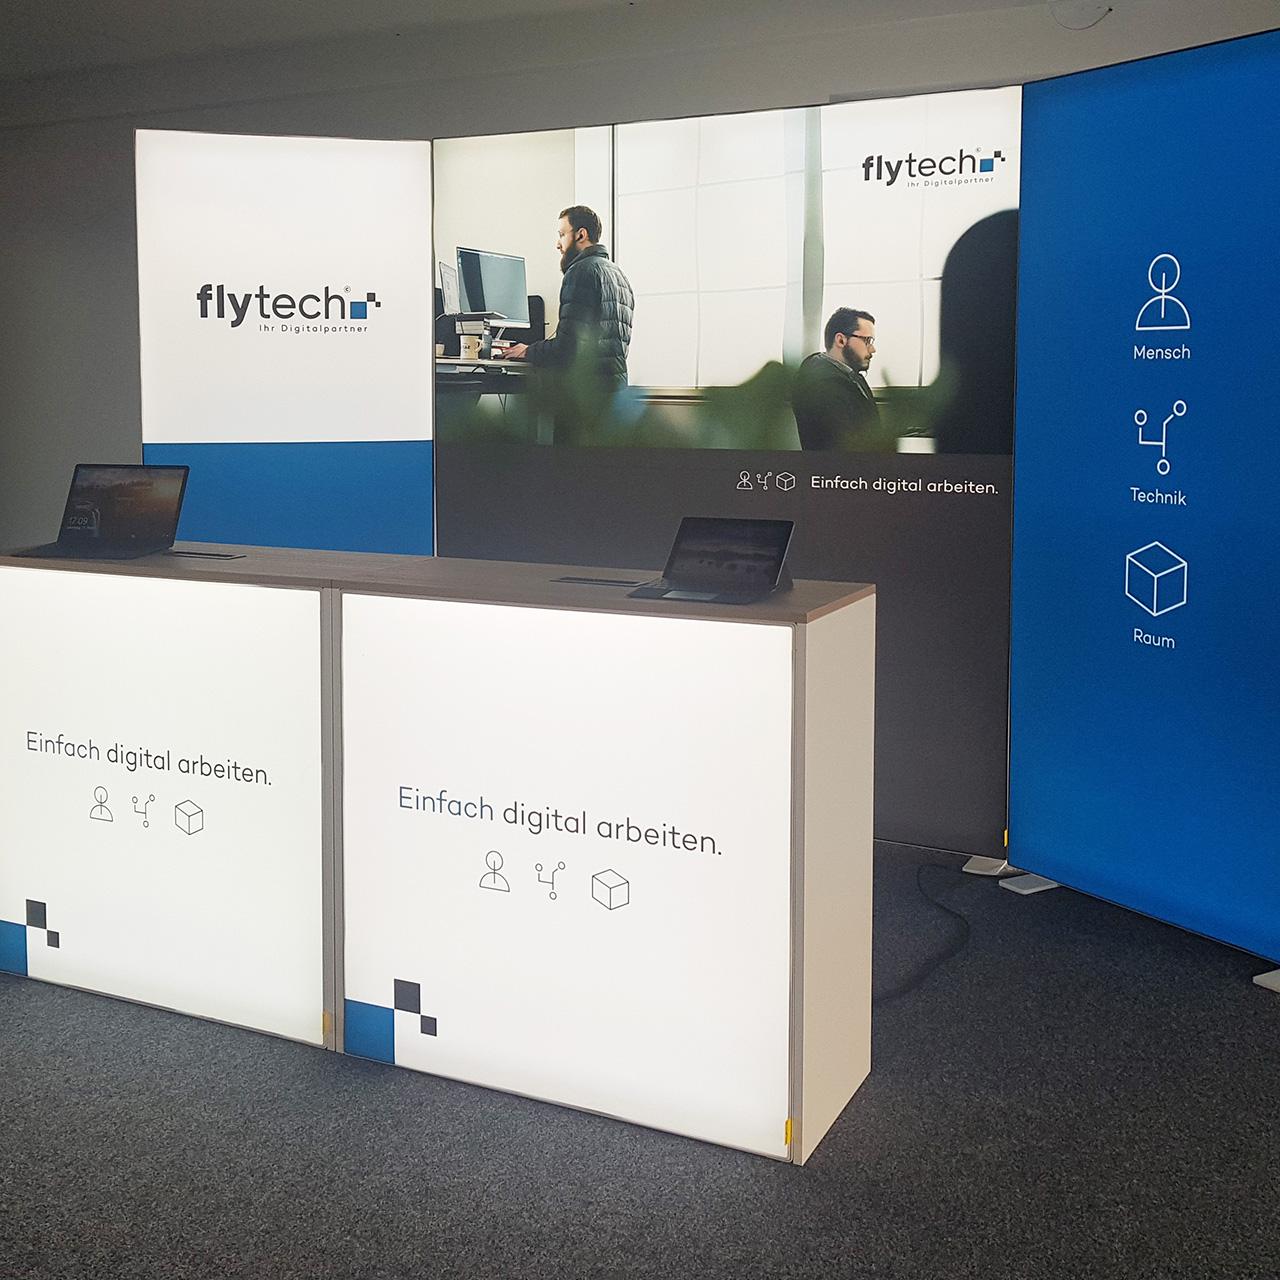 Mobiles Präsentieren mit PIXLIP GO